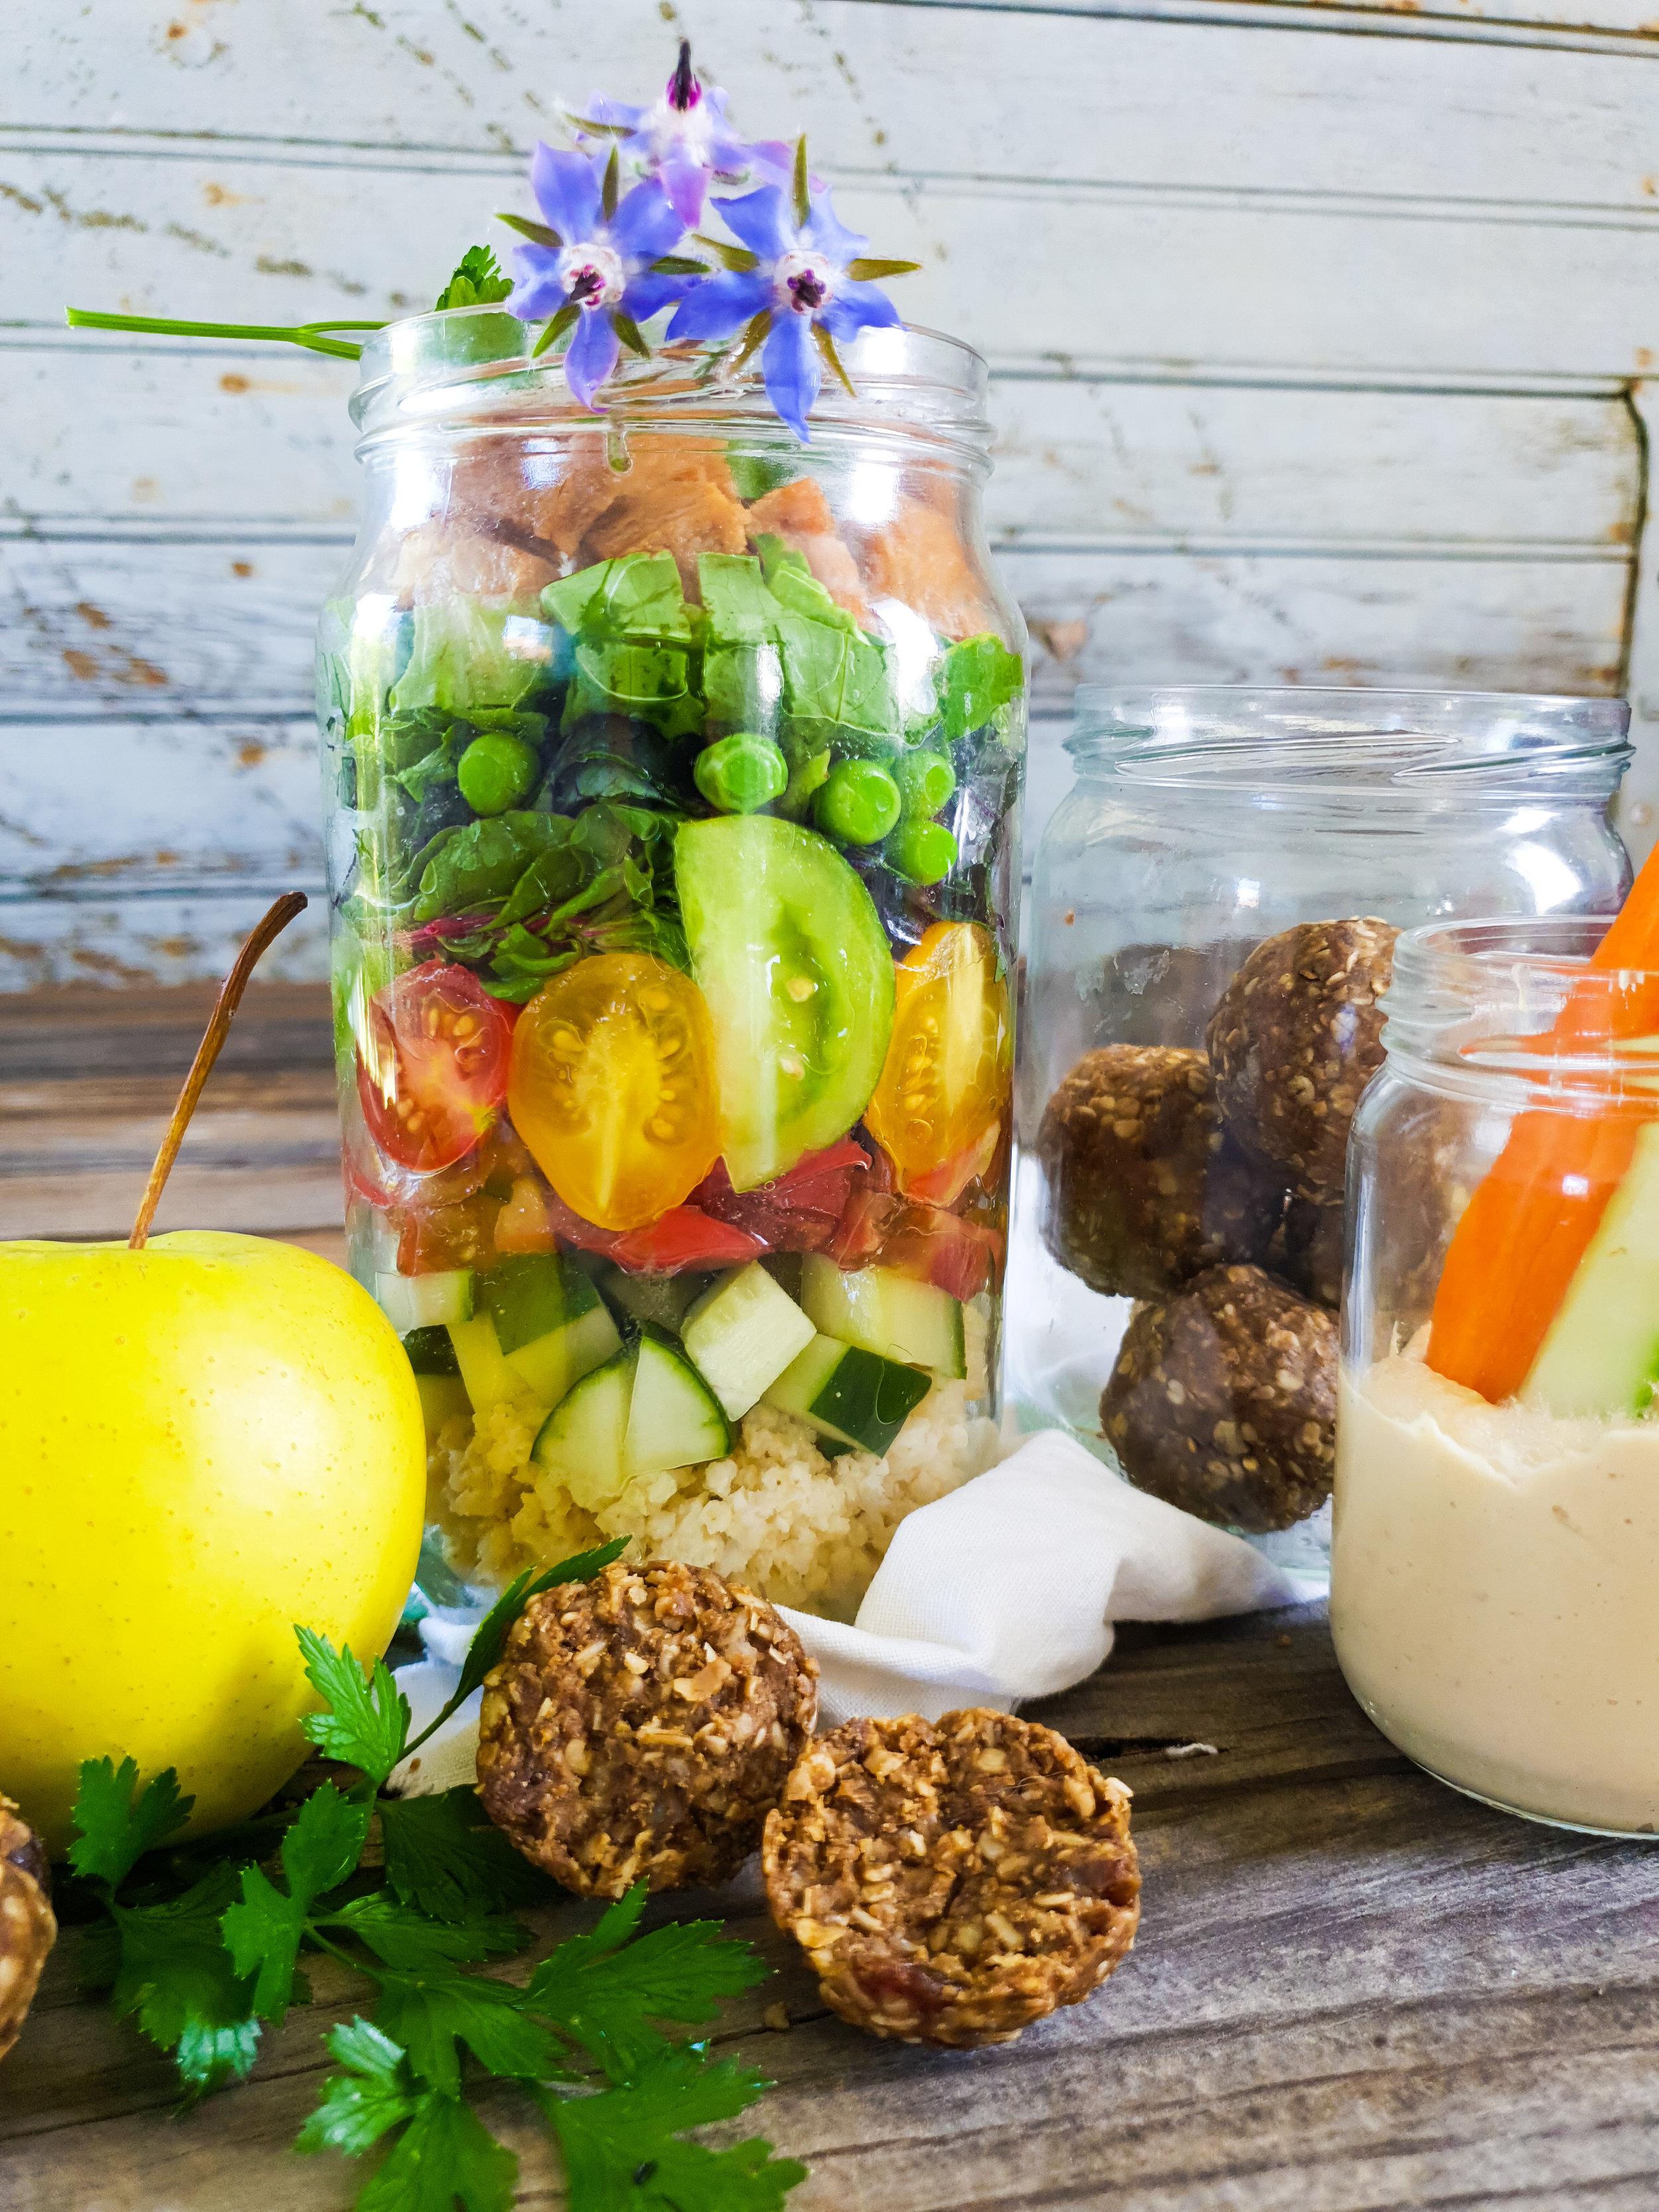 Easy Vegan Lunch Box Ideas The Tiny Vegan Life